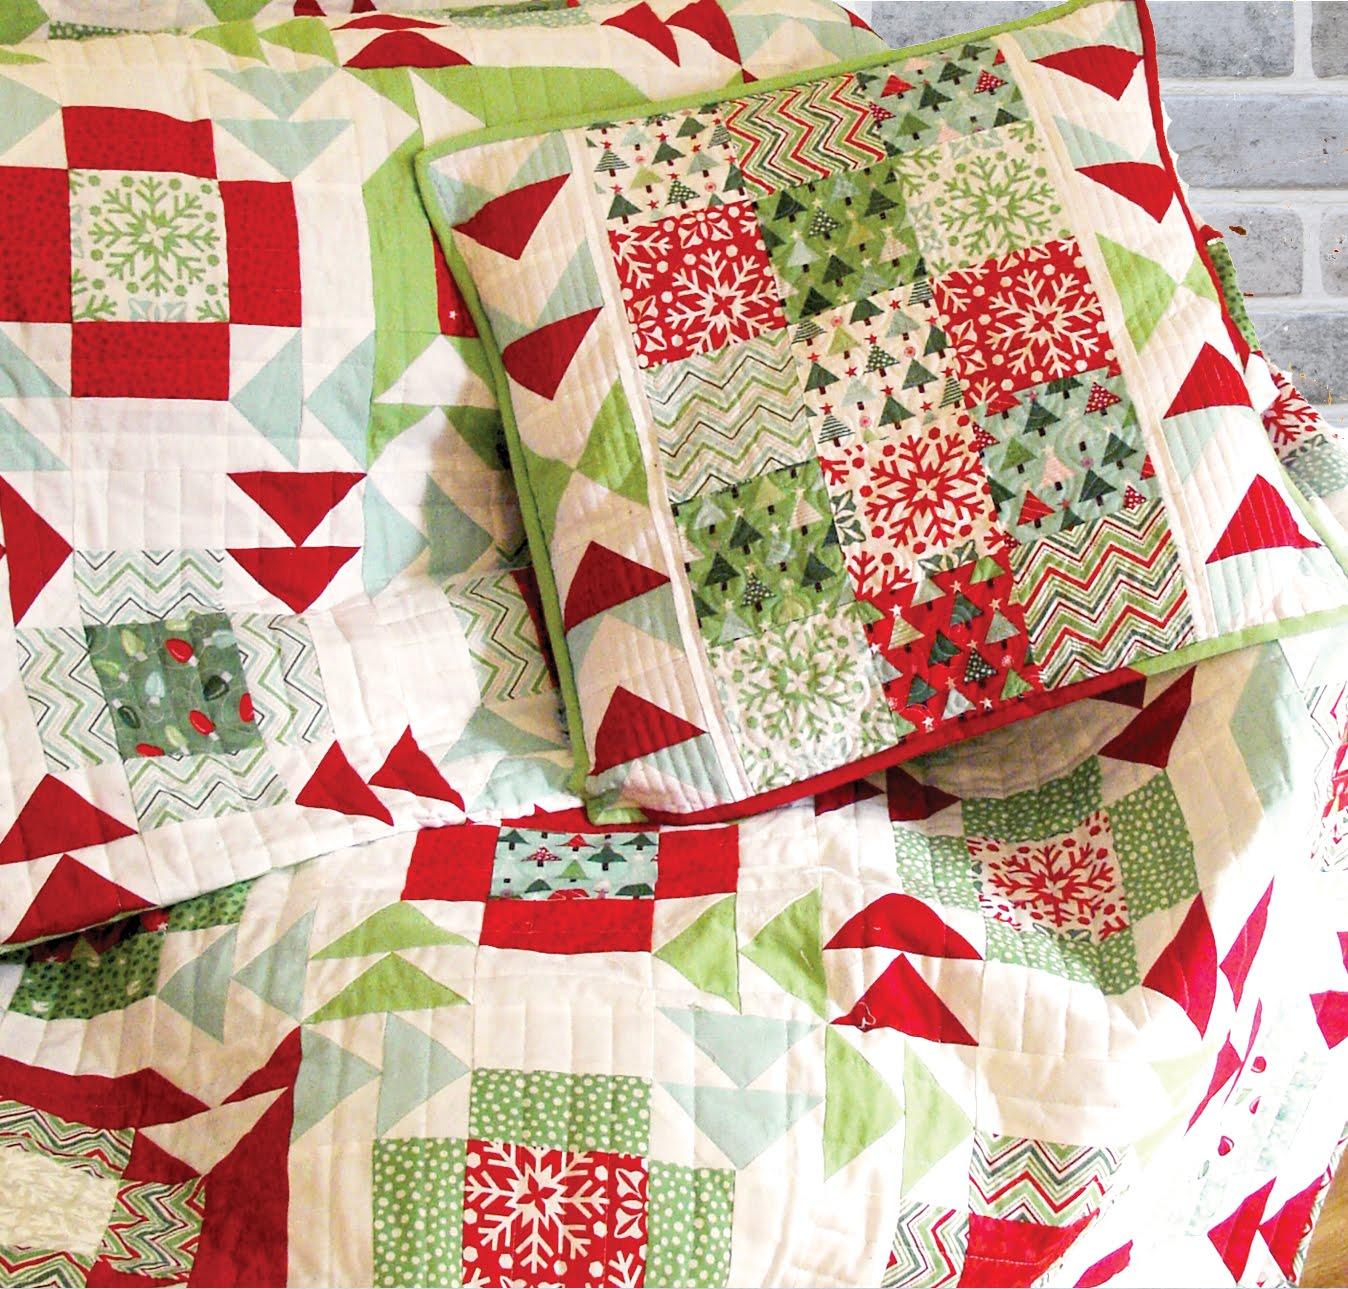 Christmas Quilt Patterns Moda : 120-Minute Gift: Yuletide Twist Pillow Moda Bake Shop